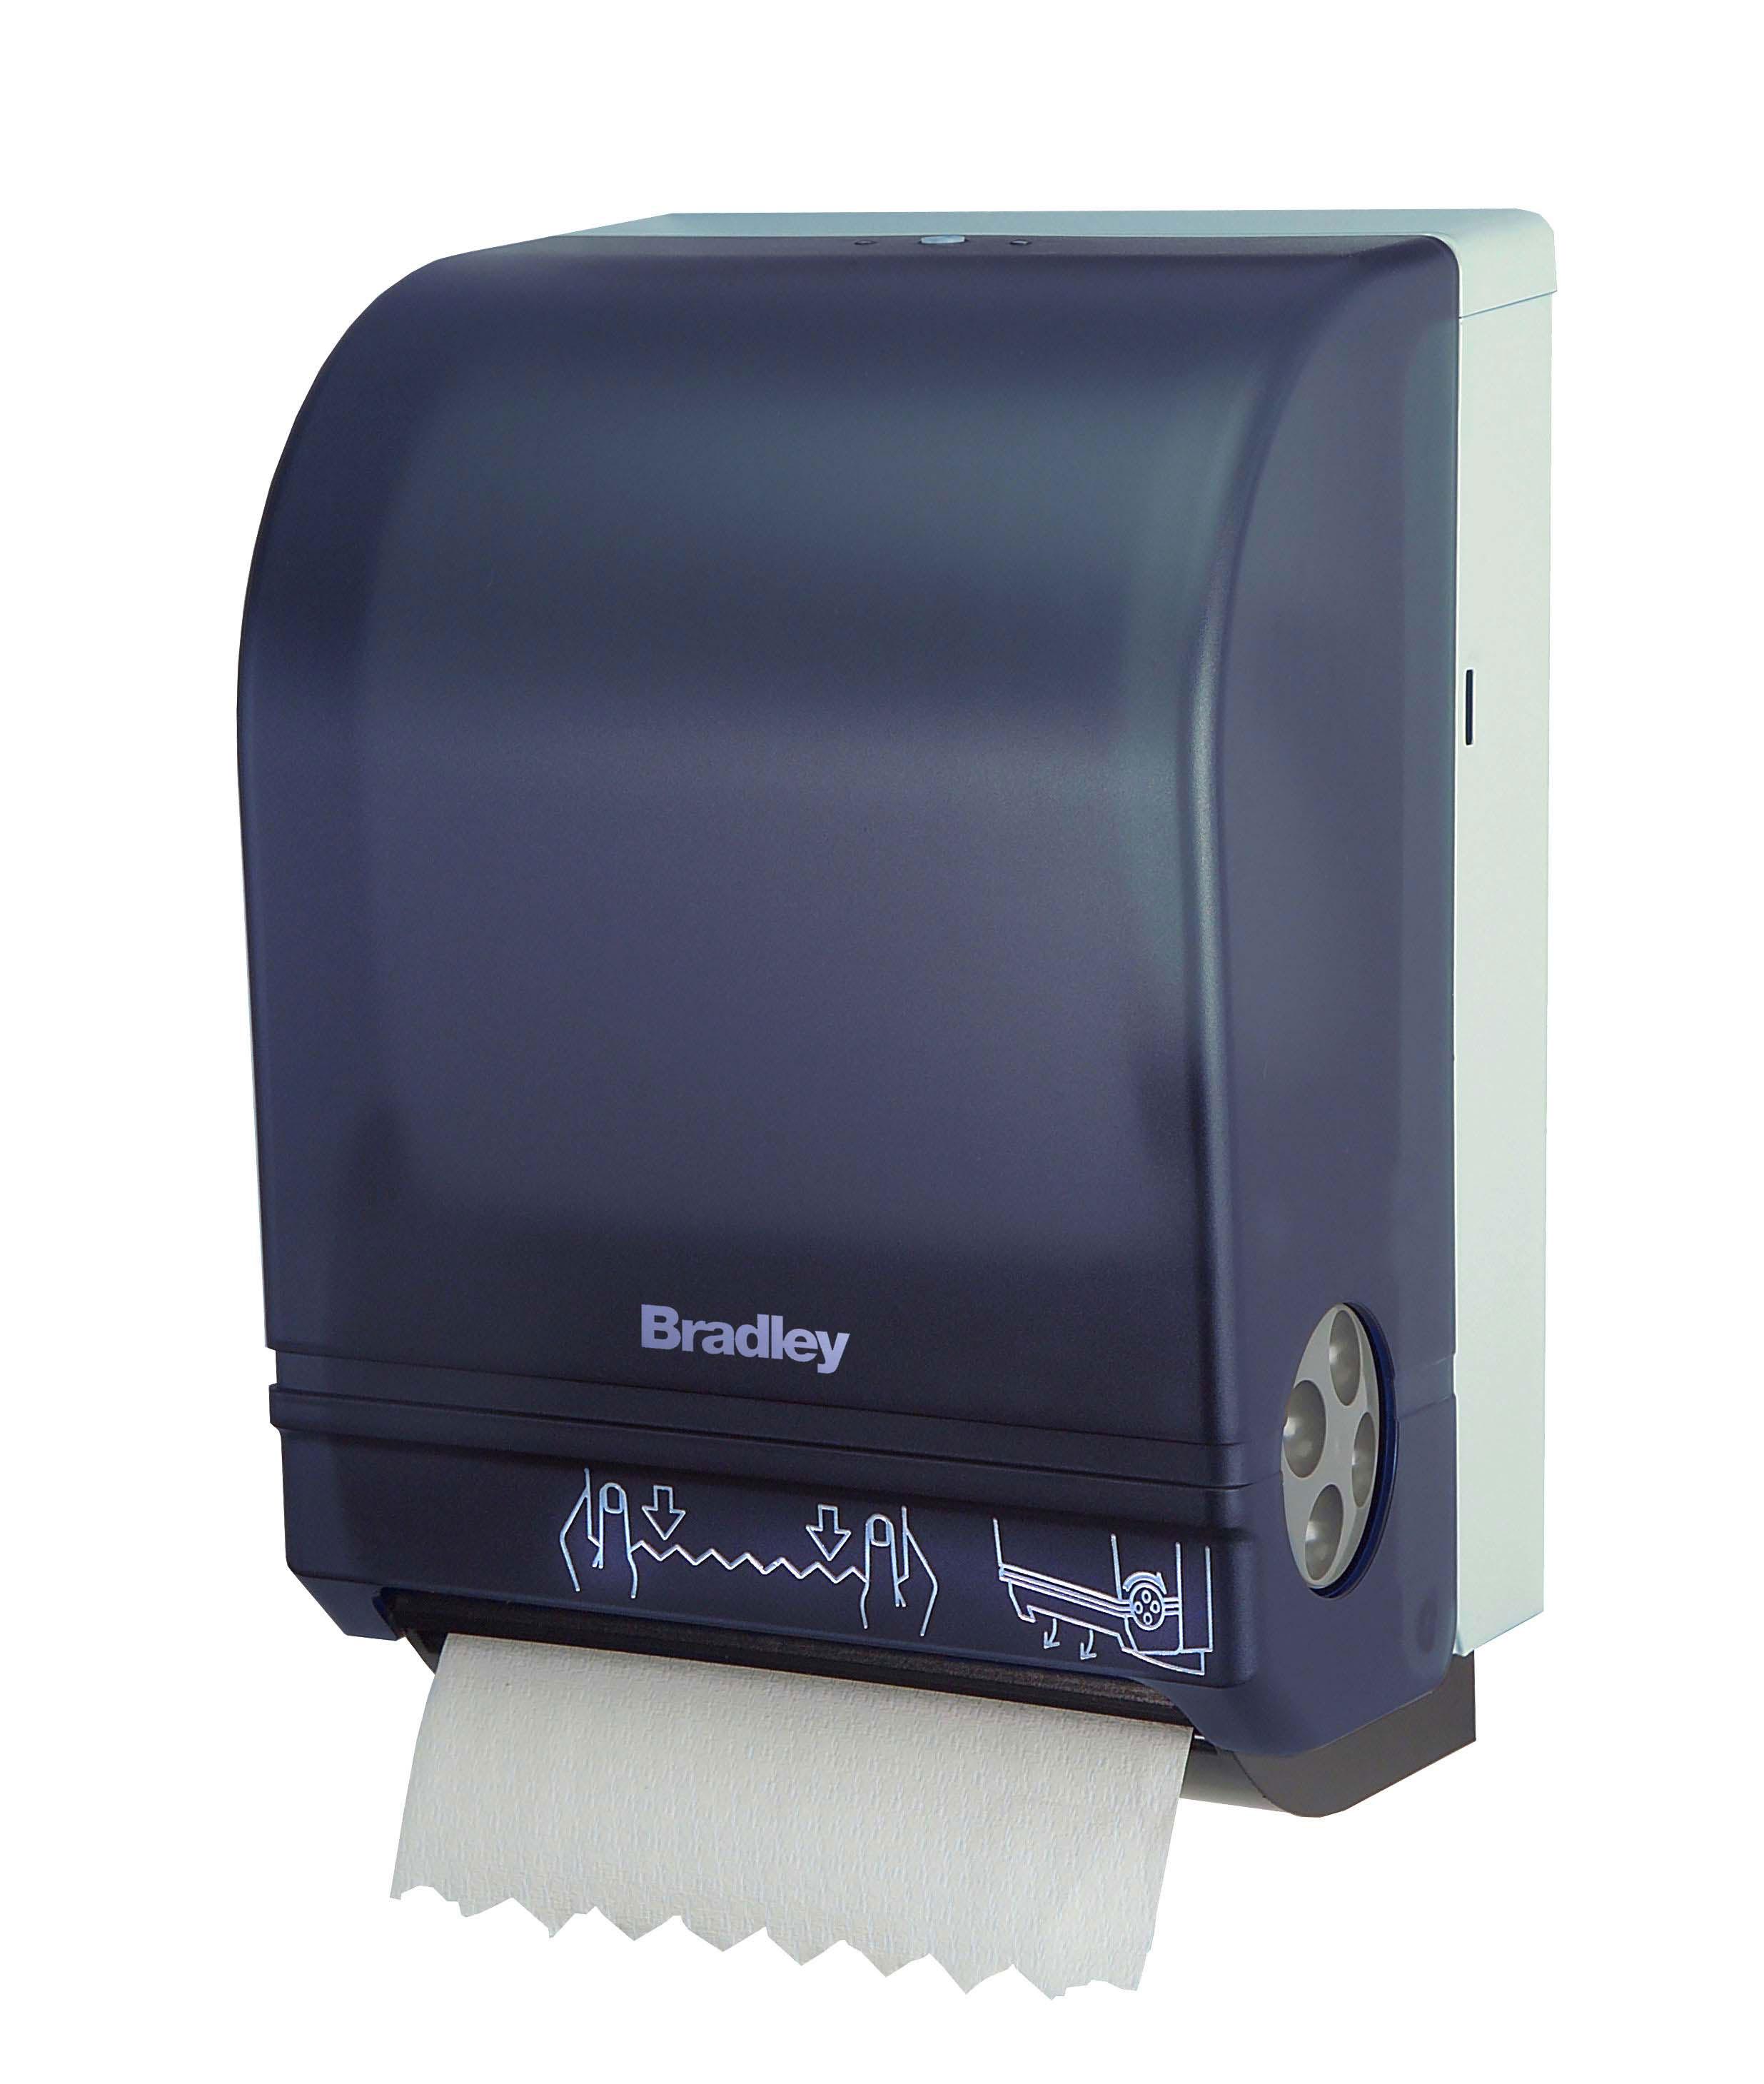 2493_mechanical-towel-dispenser.jpg